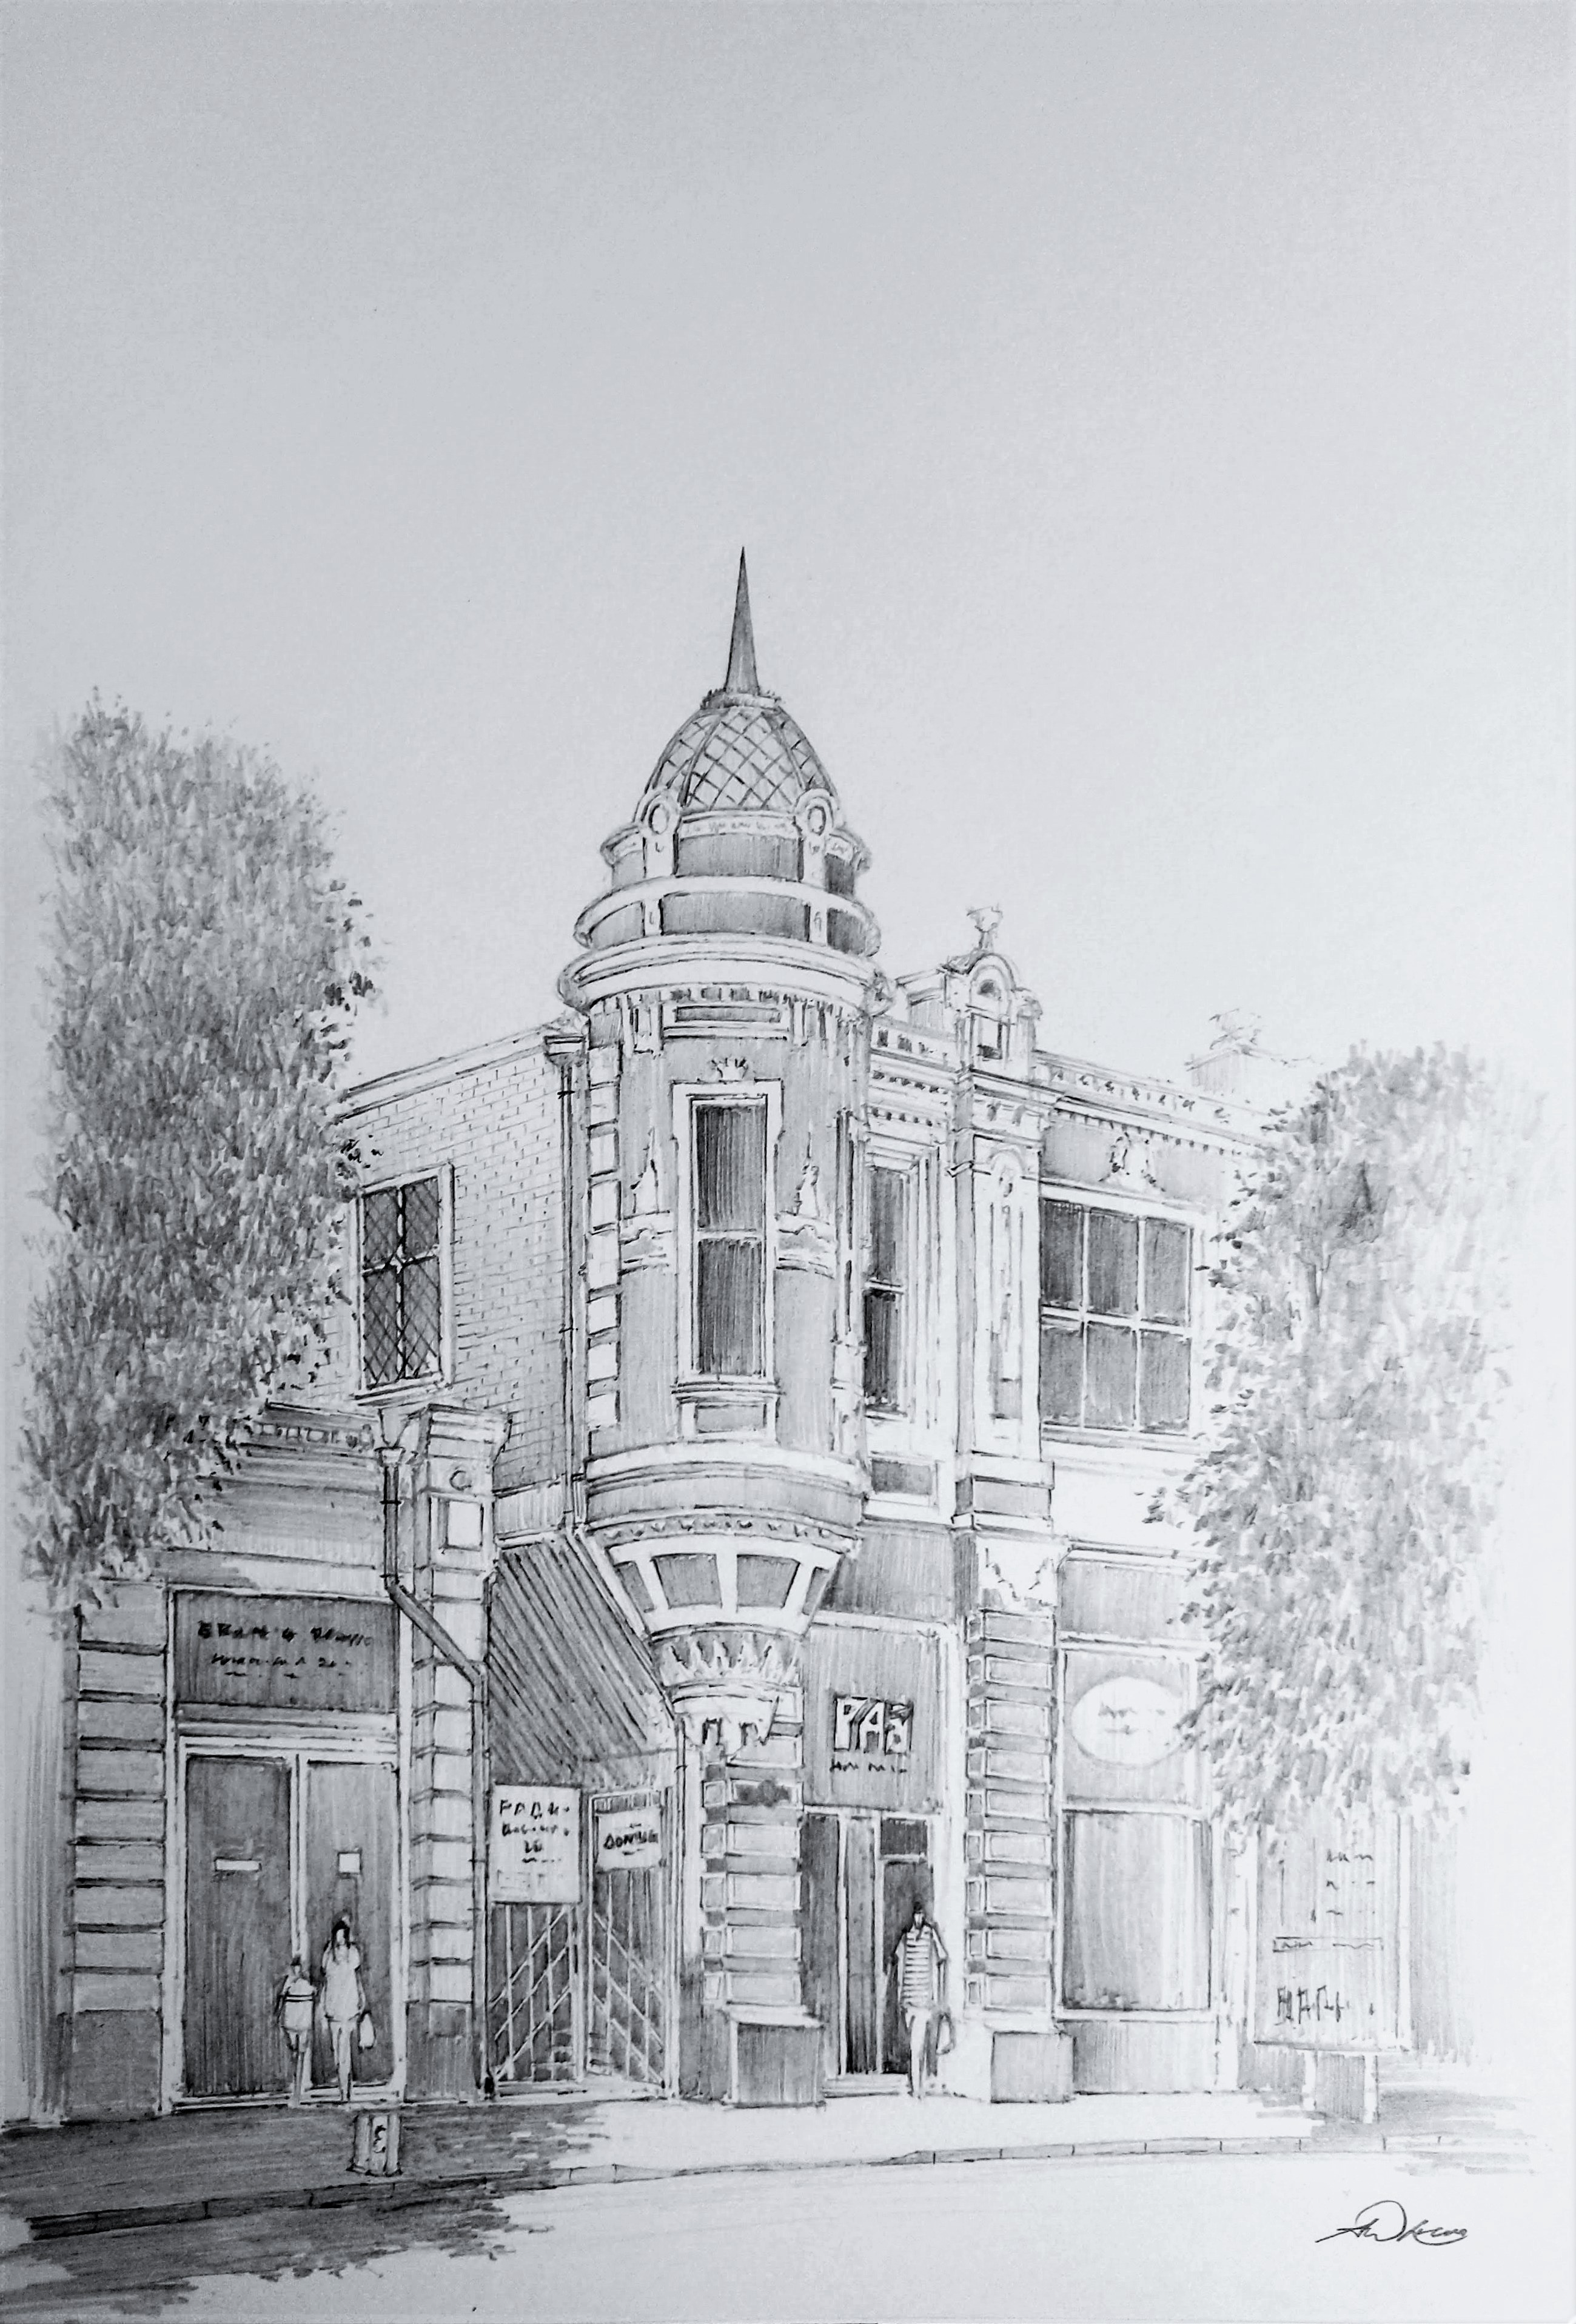 No.69 Krasnaya Street, Krasnodar, Russia.